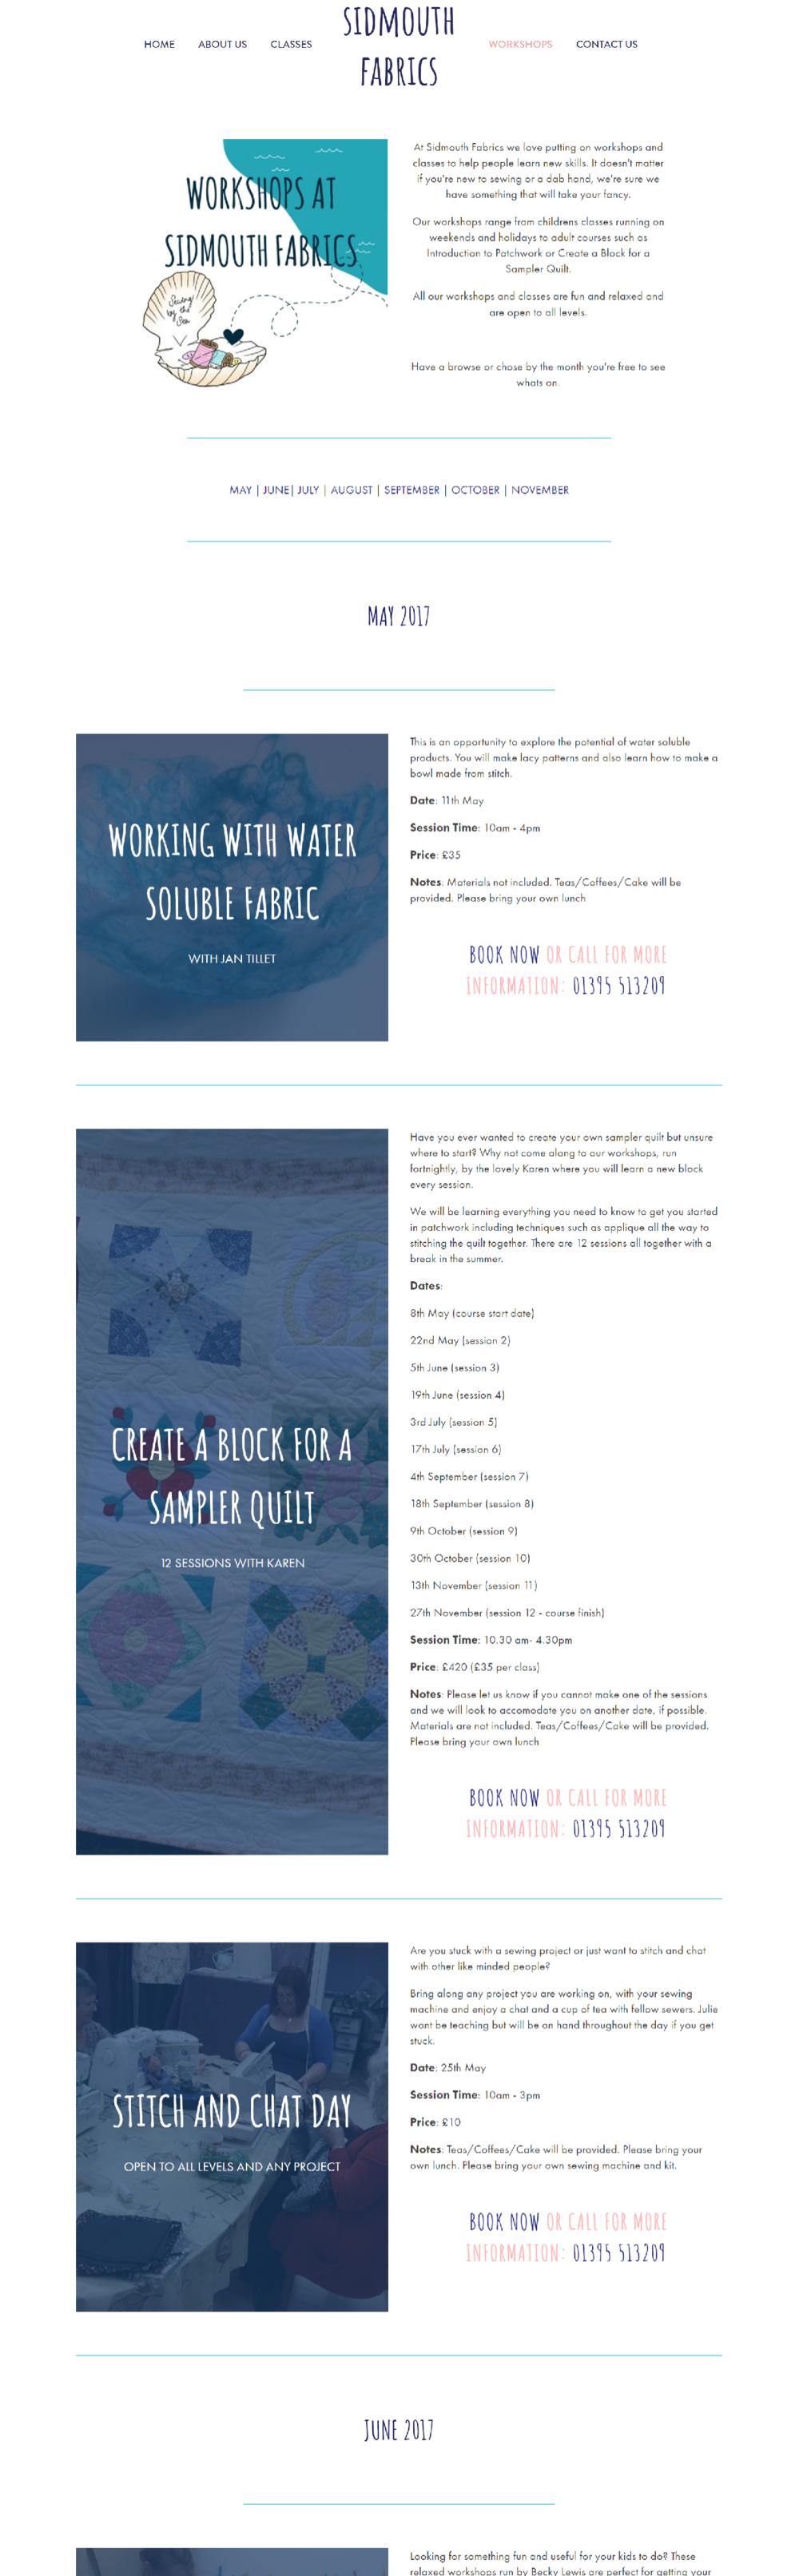 screenshot-sidmouthfabrics.com-2017-05-16-15-22-42.png